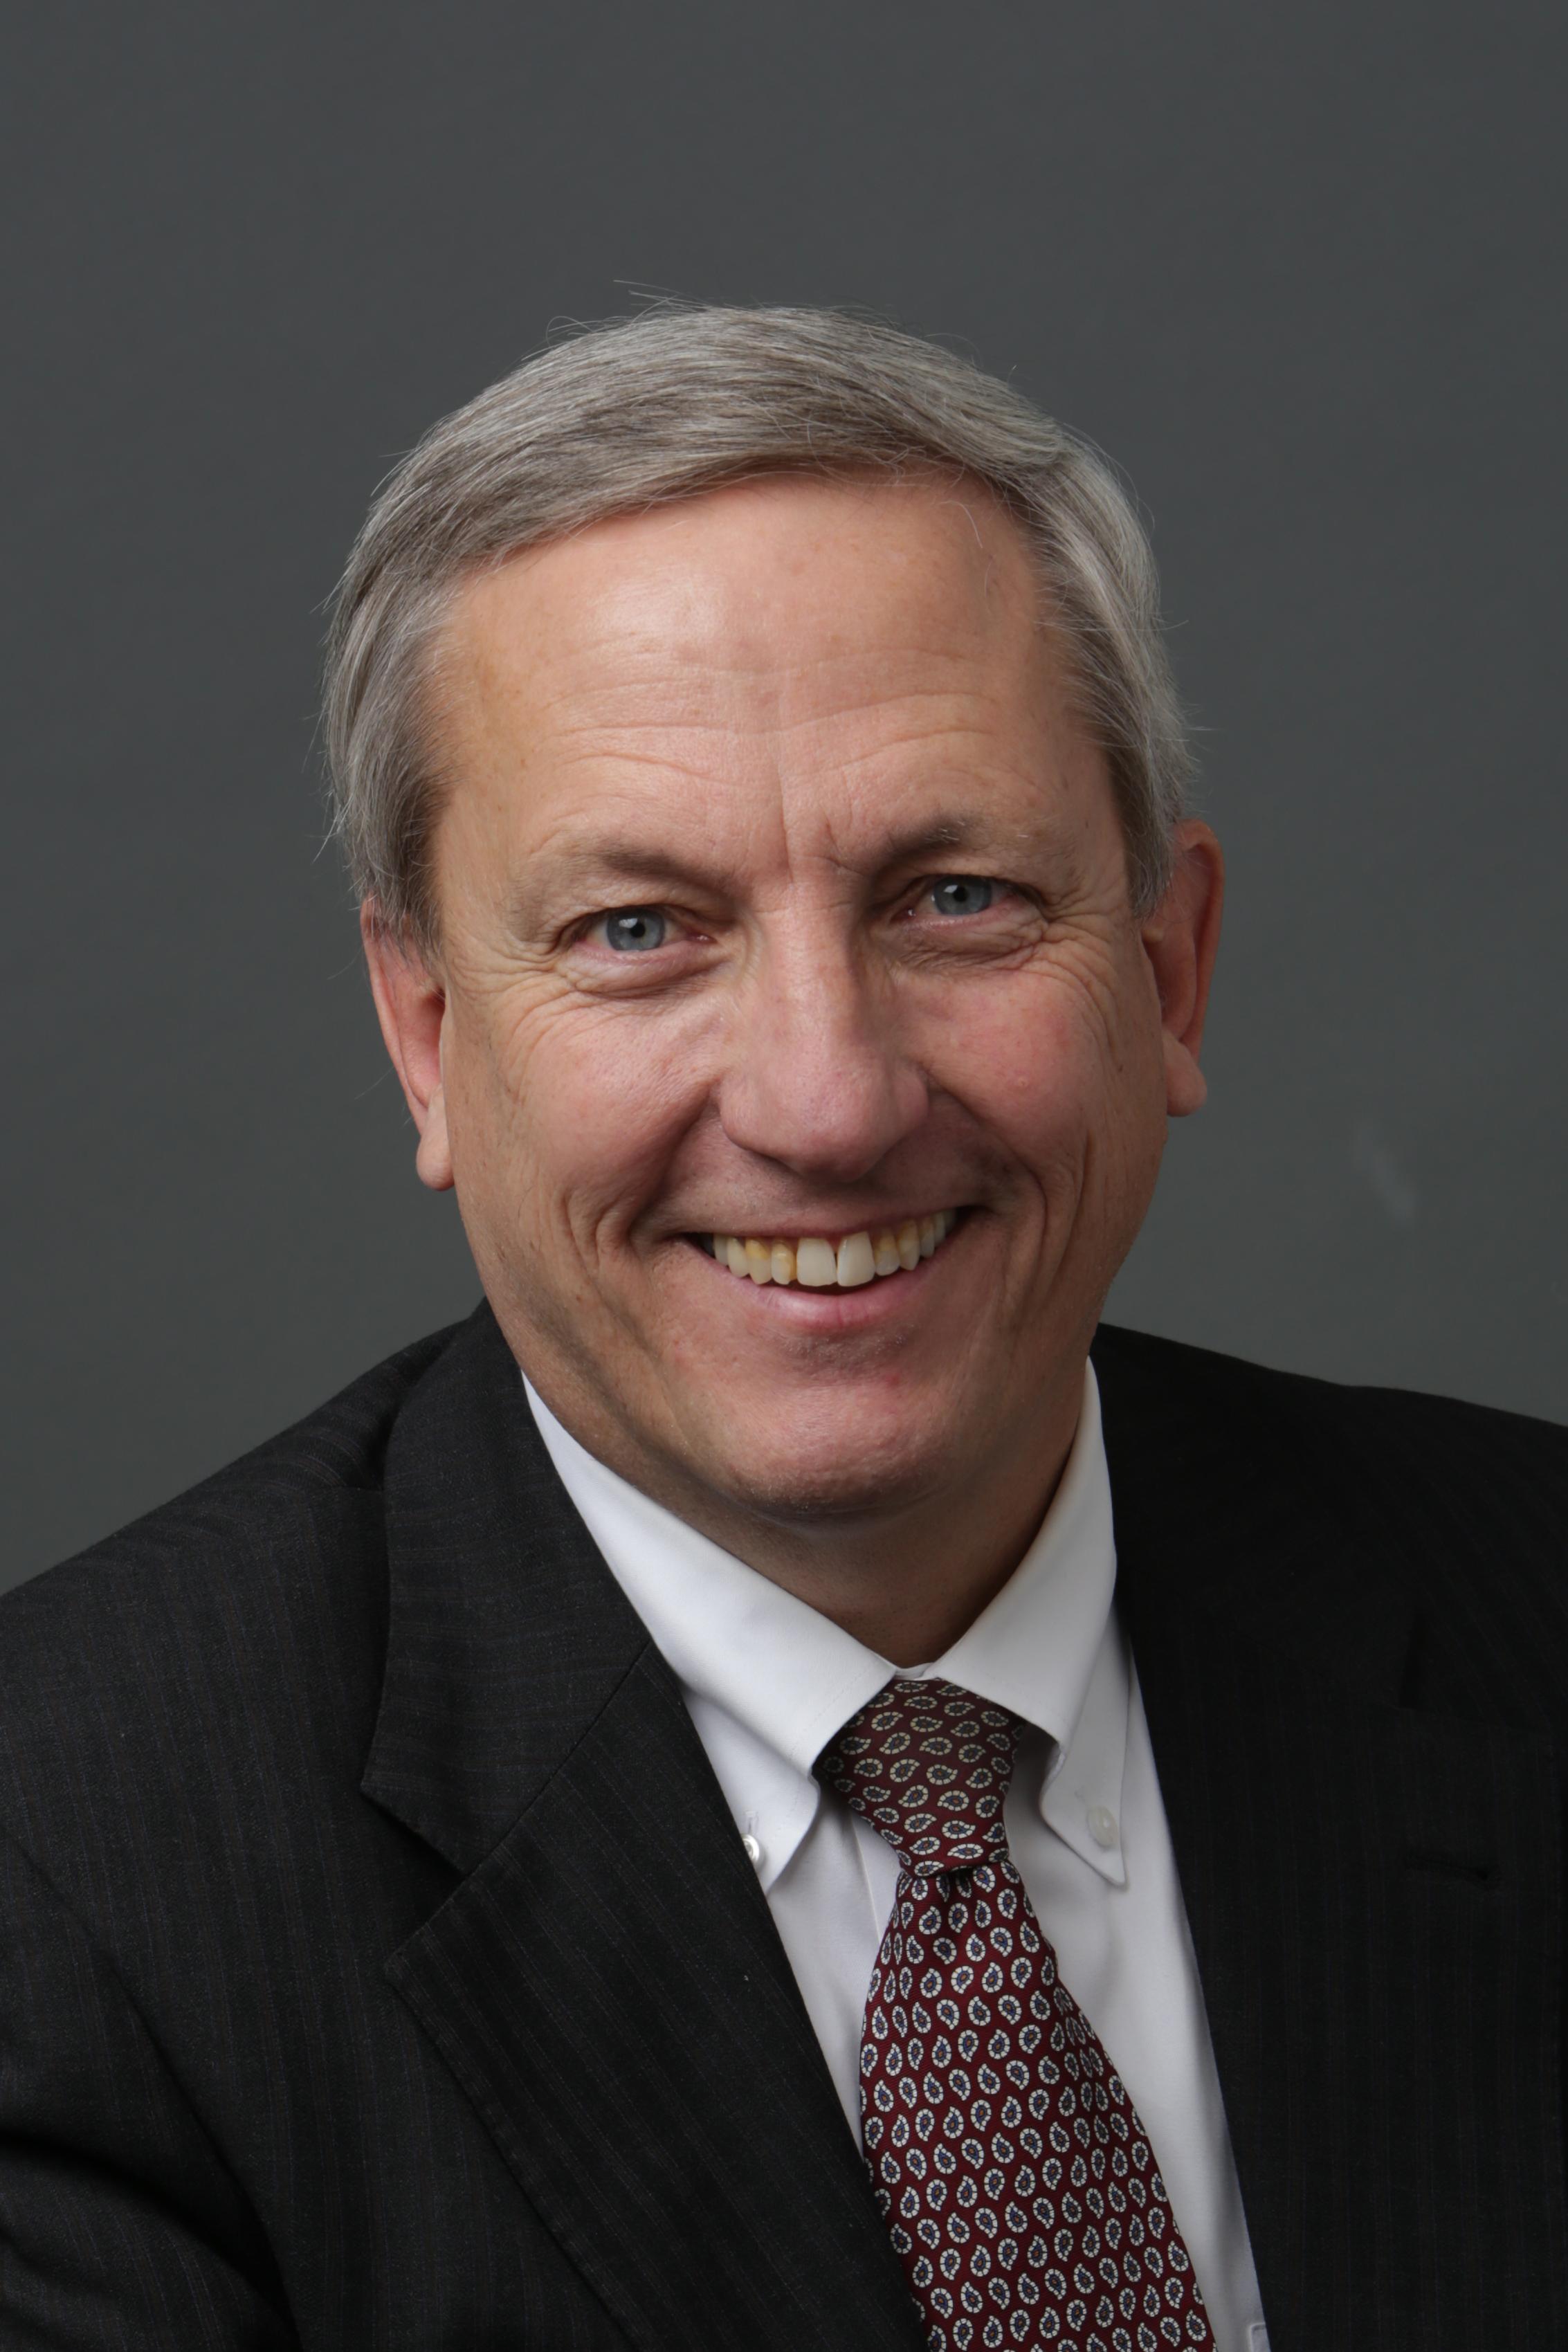 John Fitzpatrick Earns Nar Pricing Strategy Advisor Certification